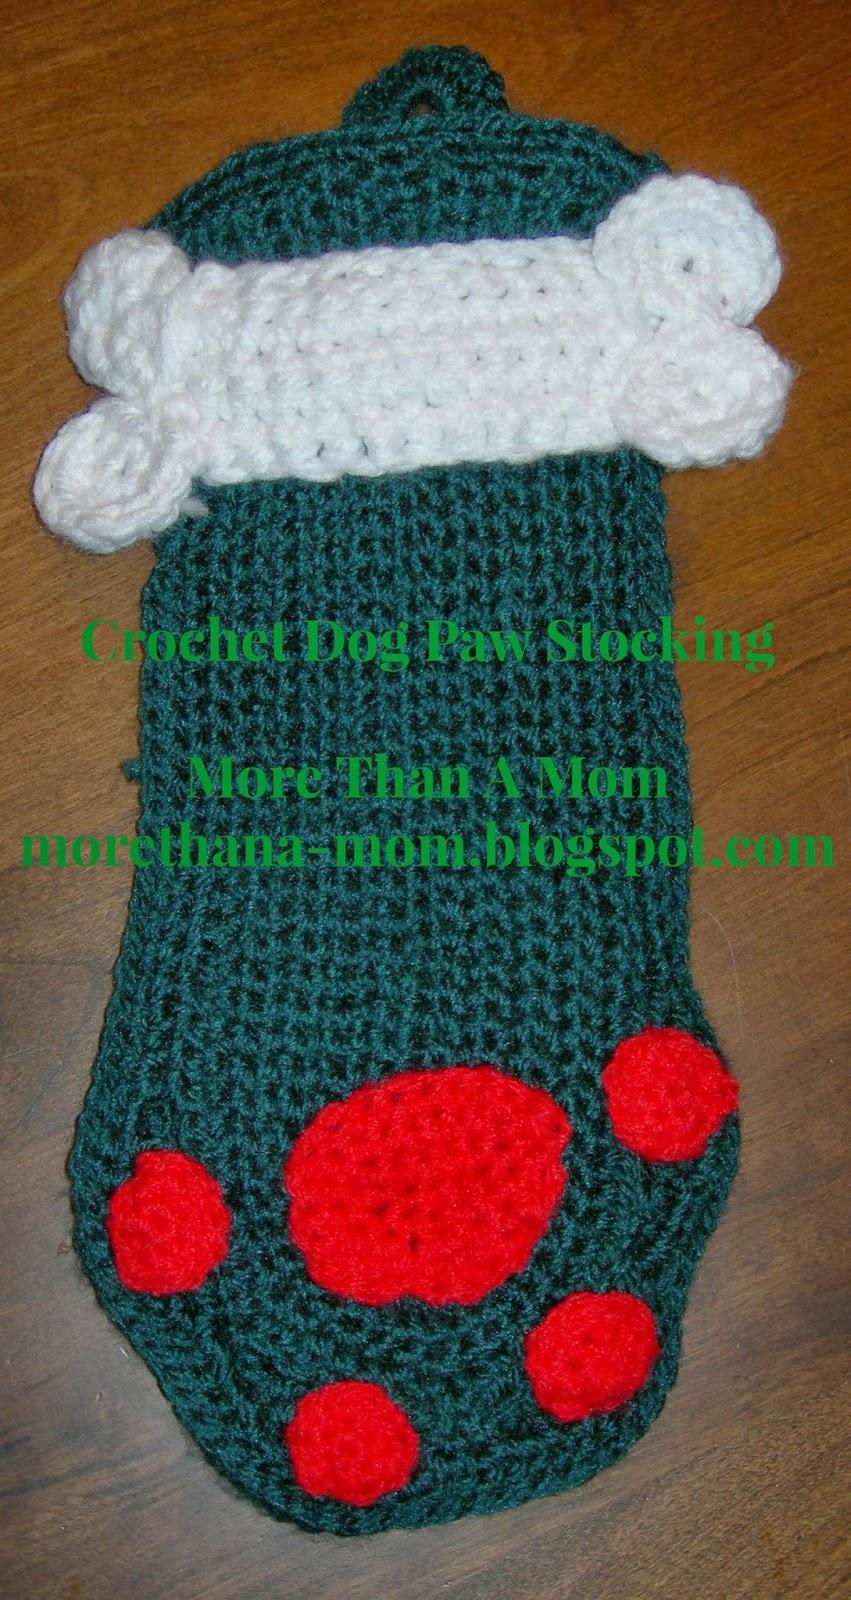 Crochet Christmas Stocking For Dog